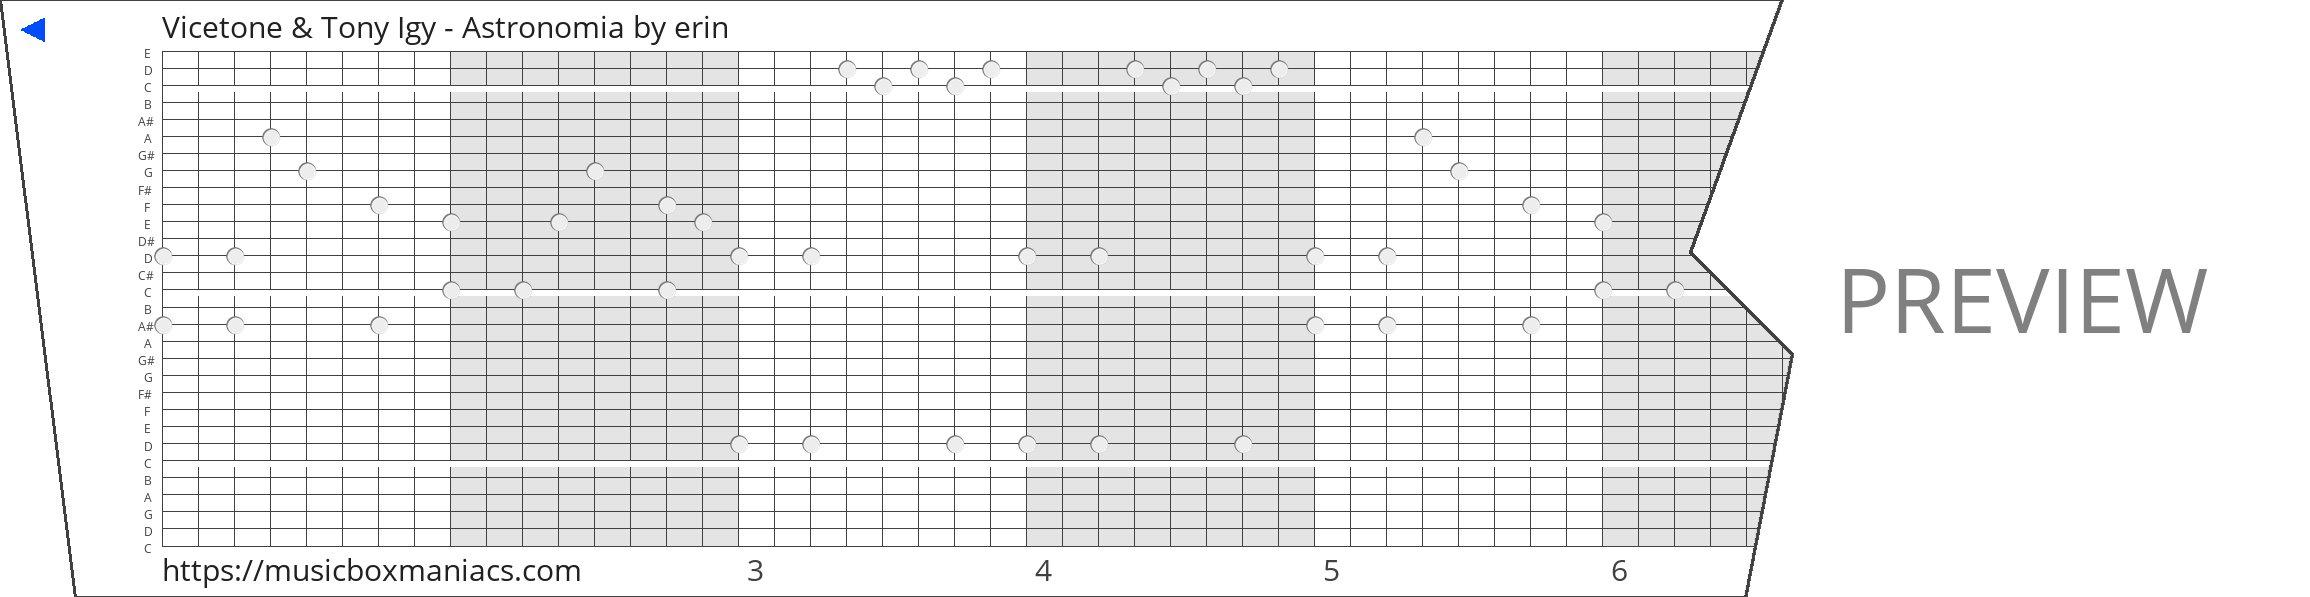 Vicetone & Tony Igy - Astronomia 30 note music box paper strip